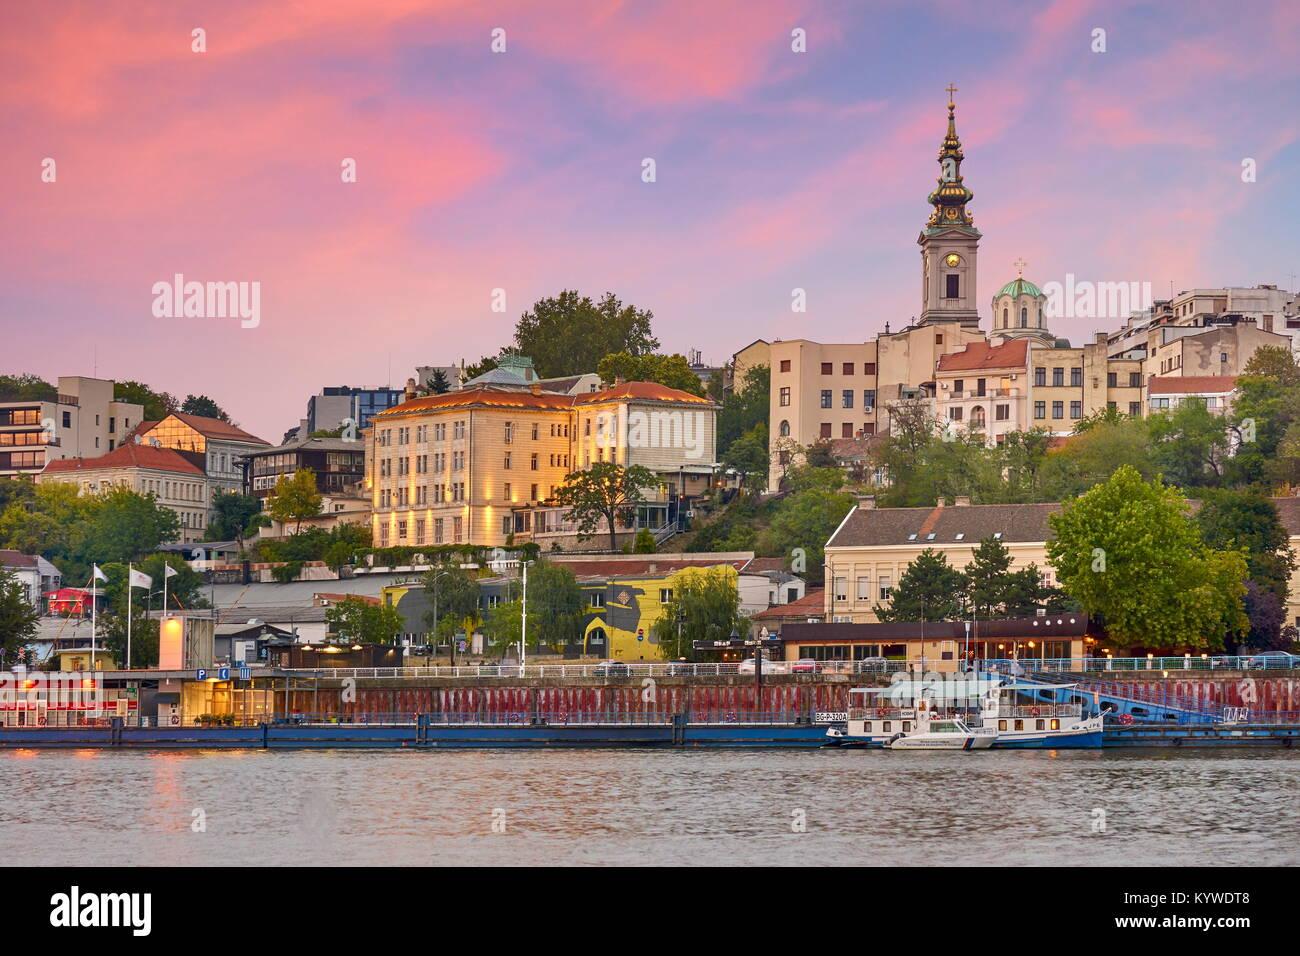 Abendlicher Blick in Belgrad, die Hauptstadt Serbiens Stockbild